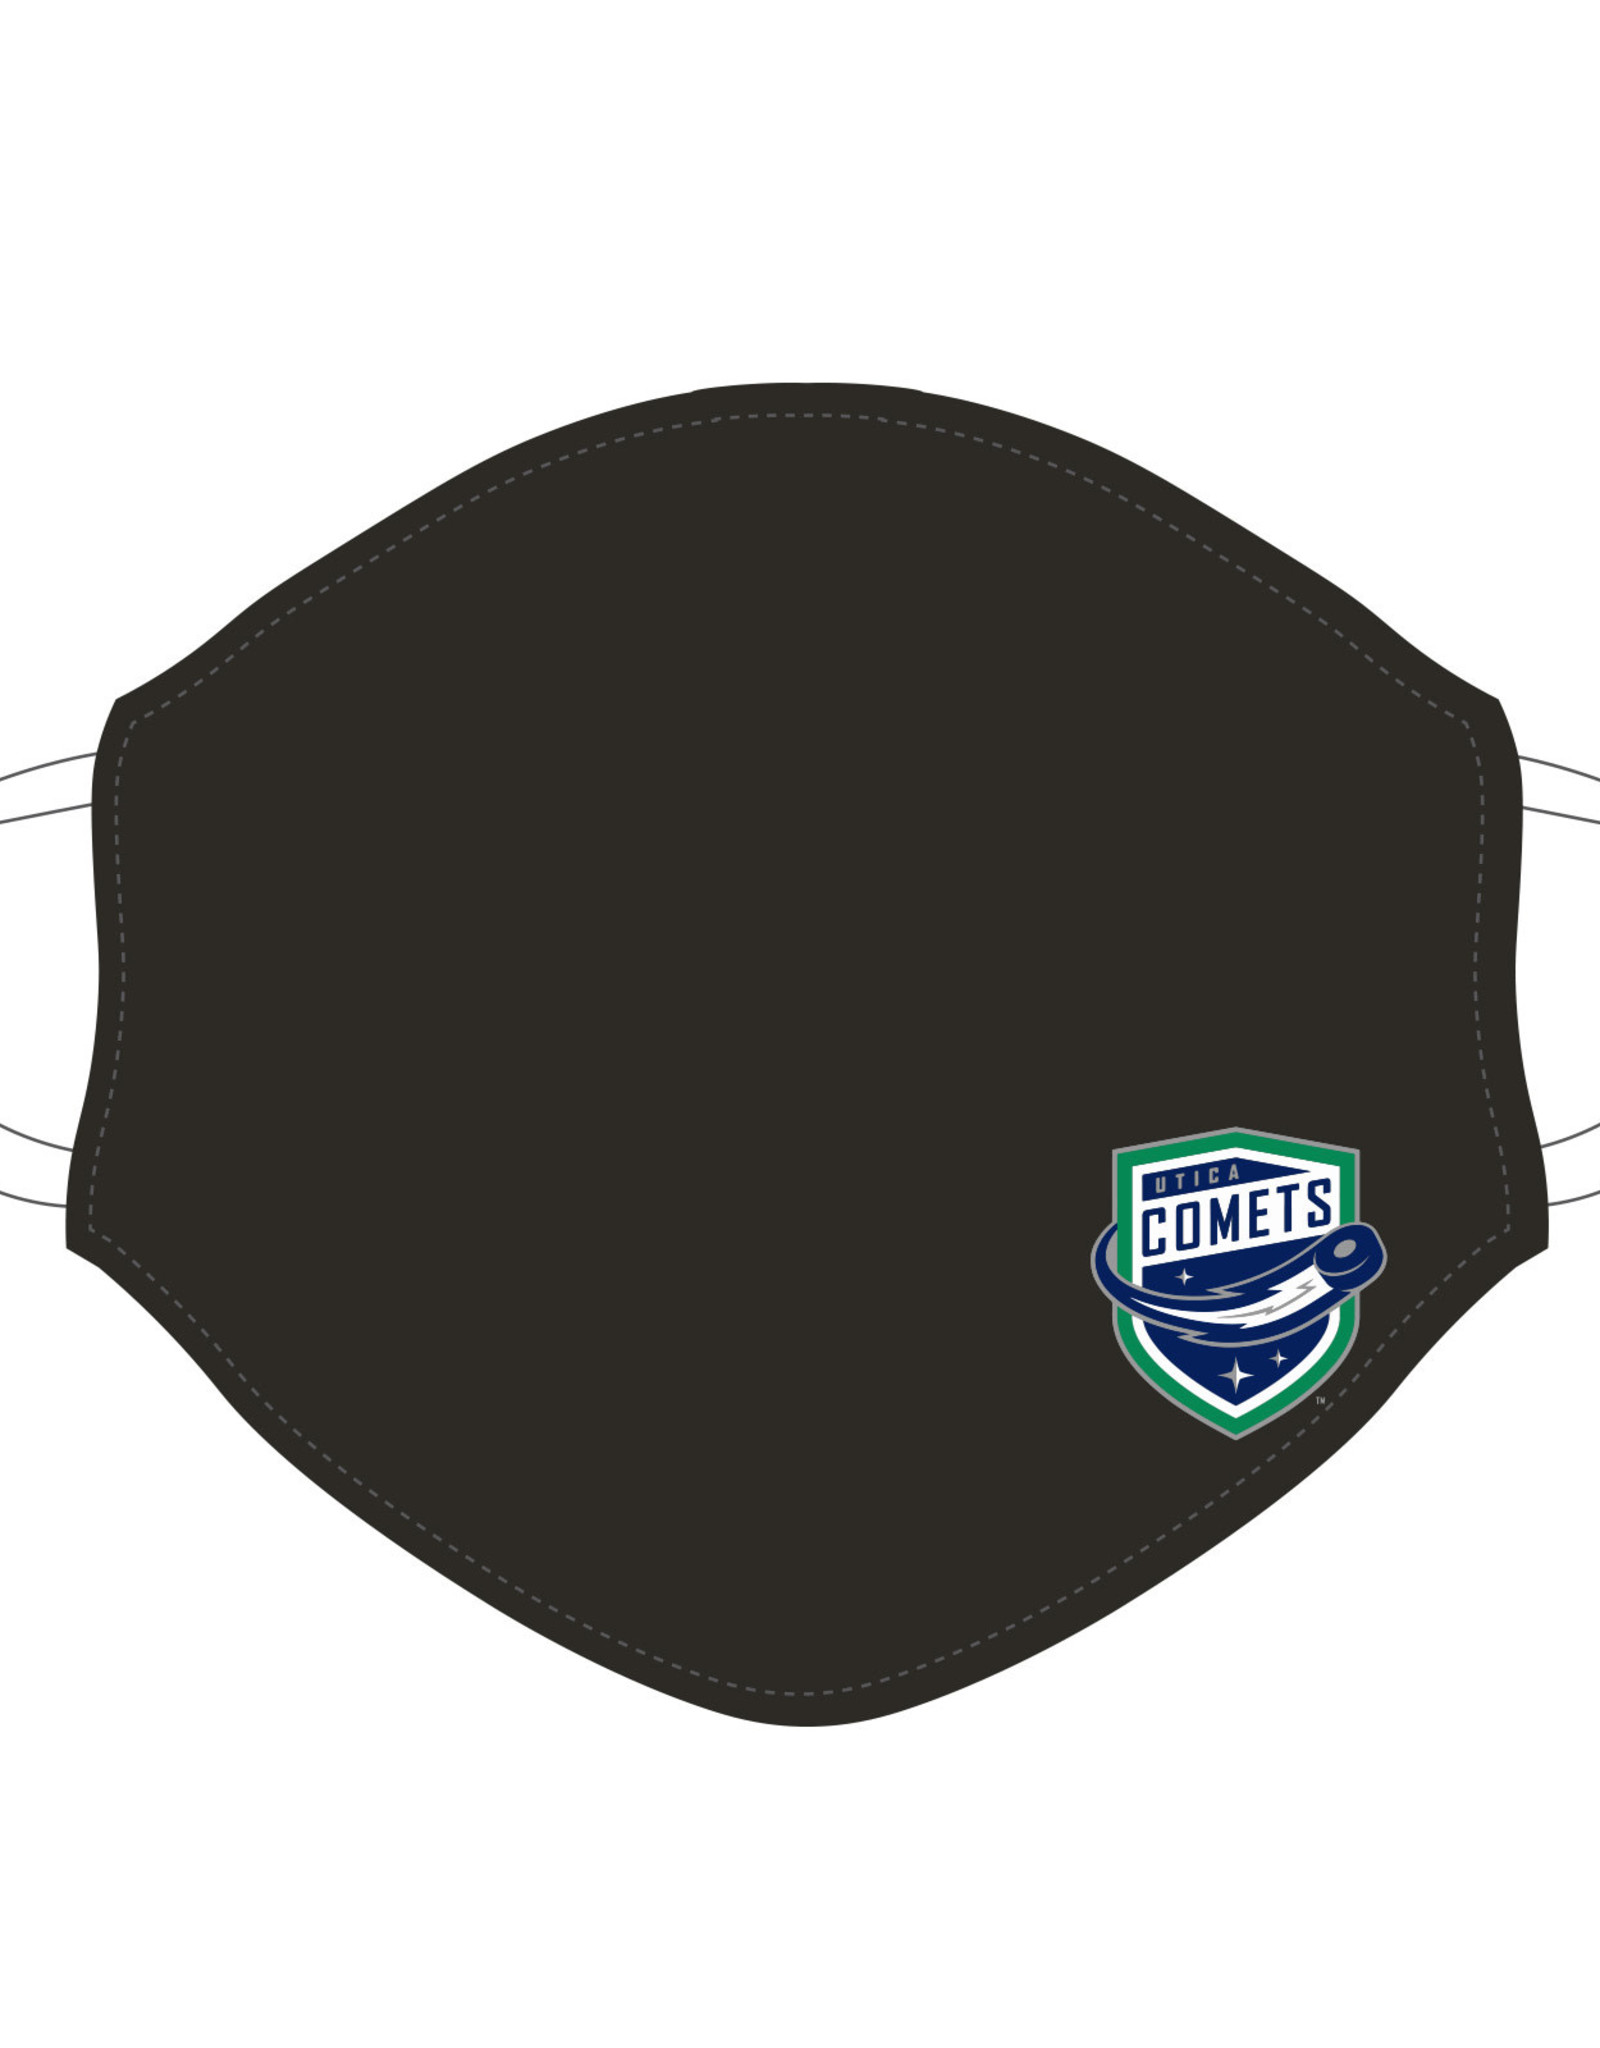 Utica Comets Face Covering (Black w/ Comets Logo)